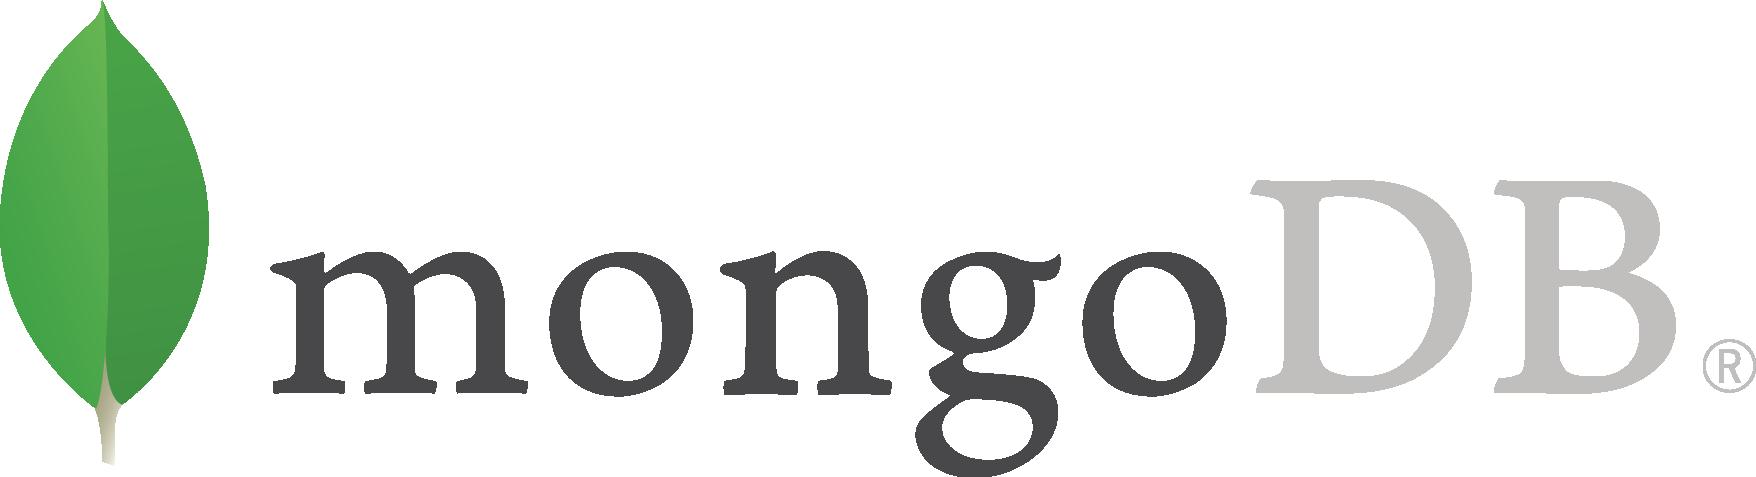 mongodb_logo1-76twgcu2dm.png